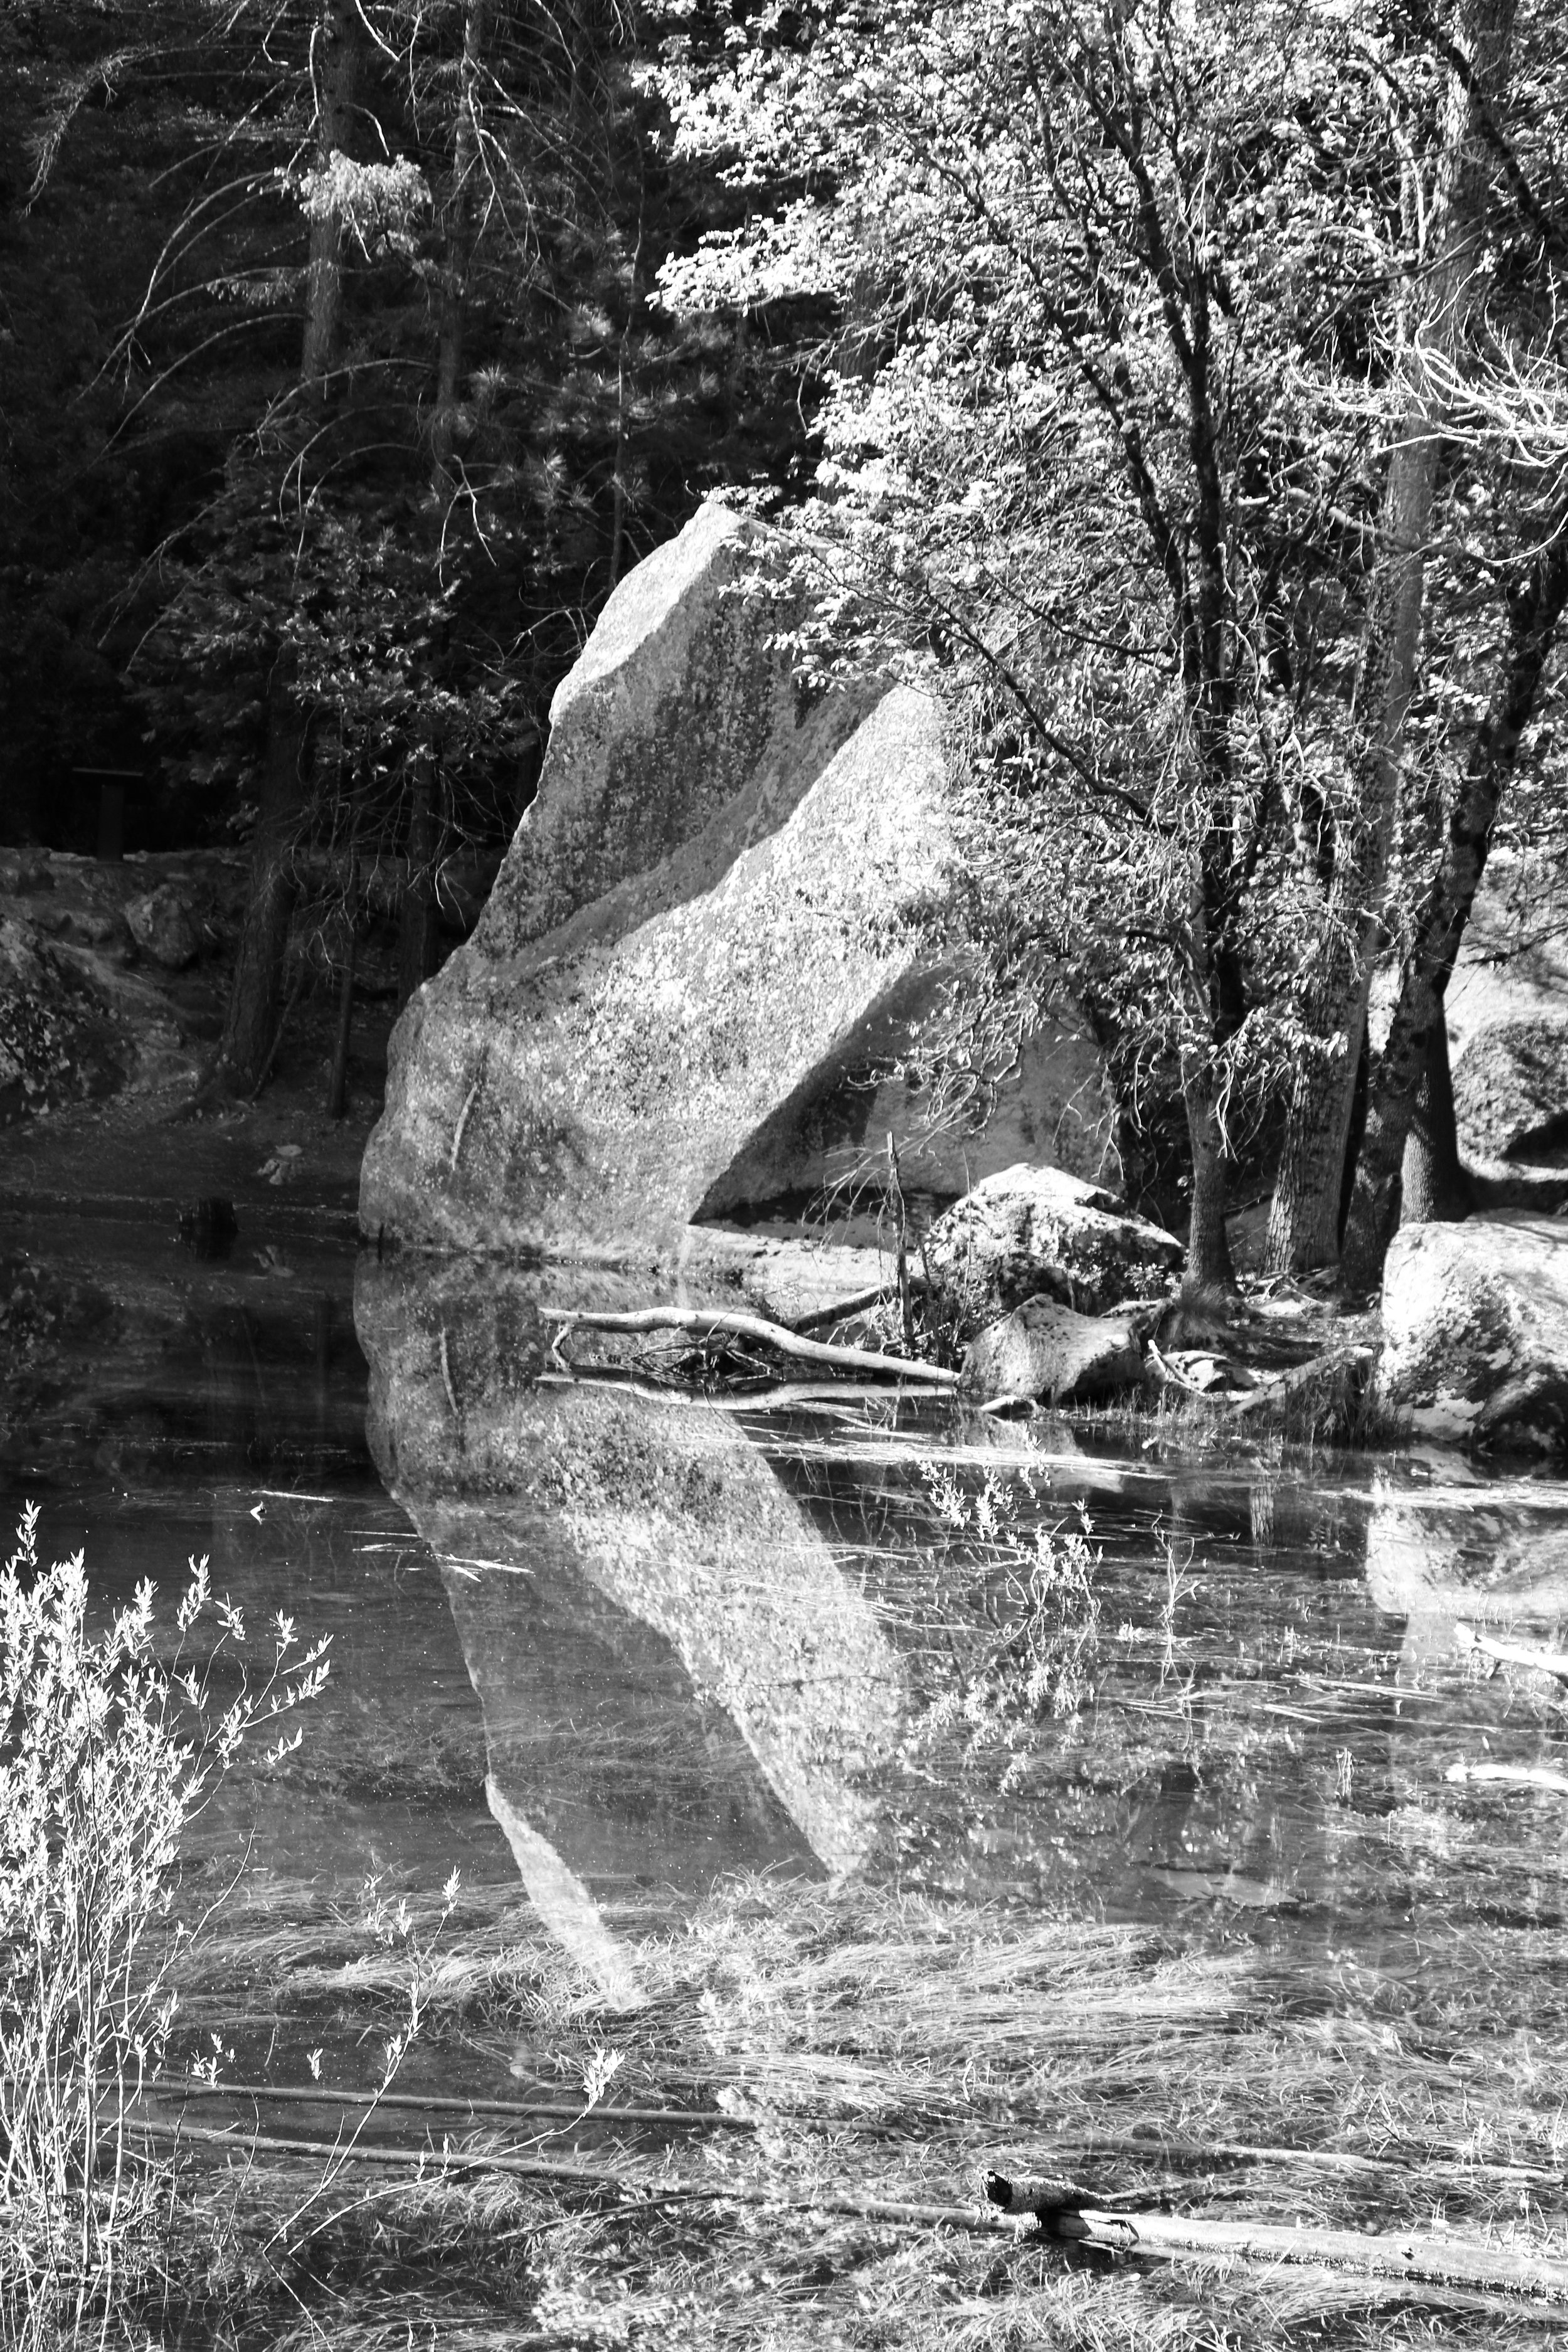 Reflections on Mirror Lake - Yosemite